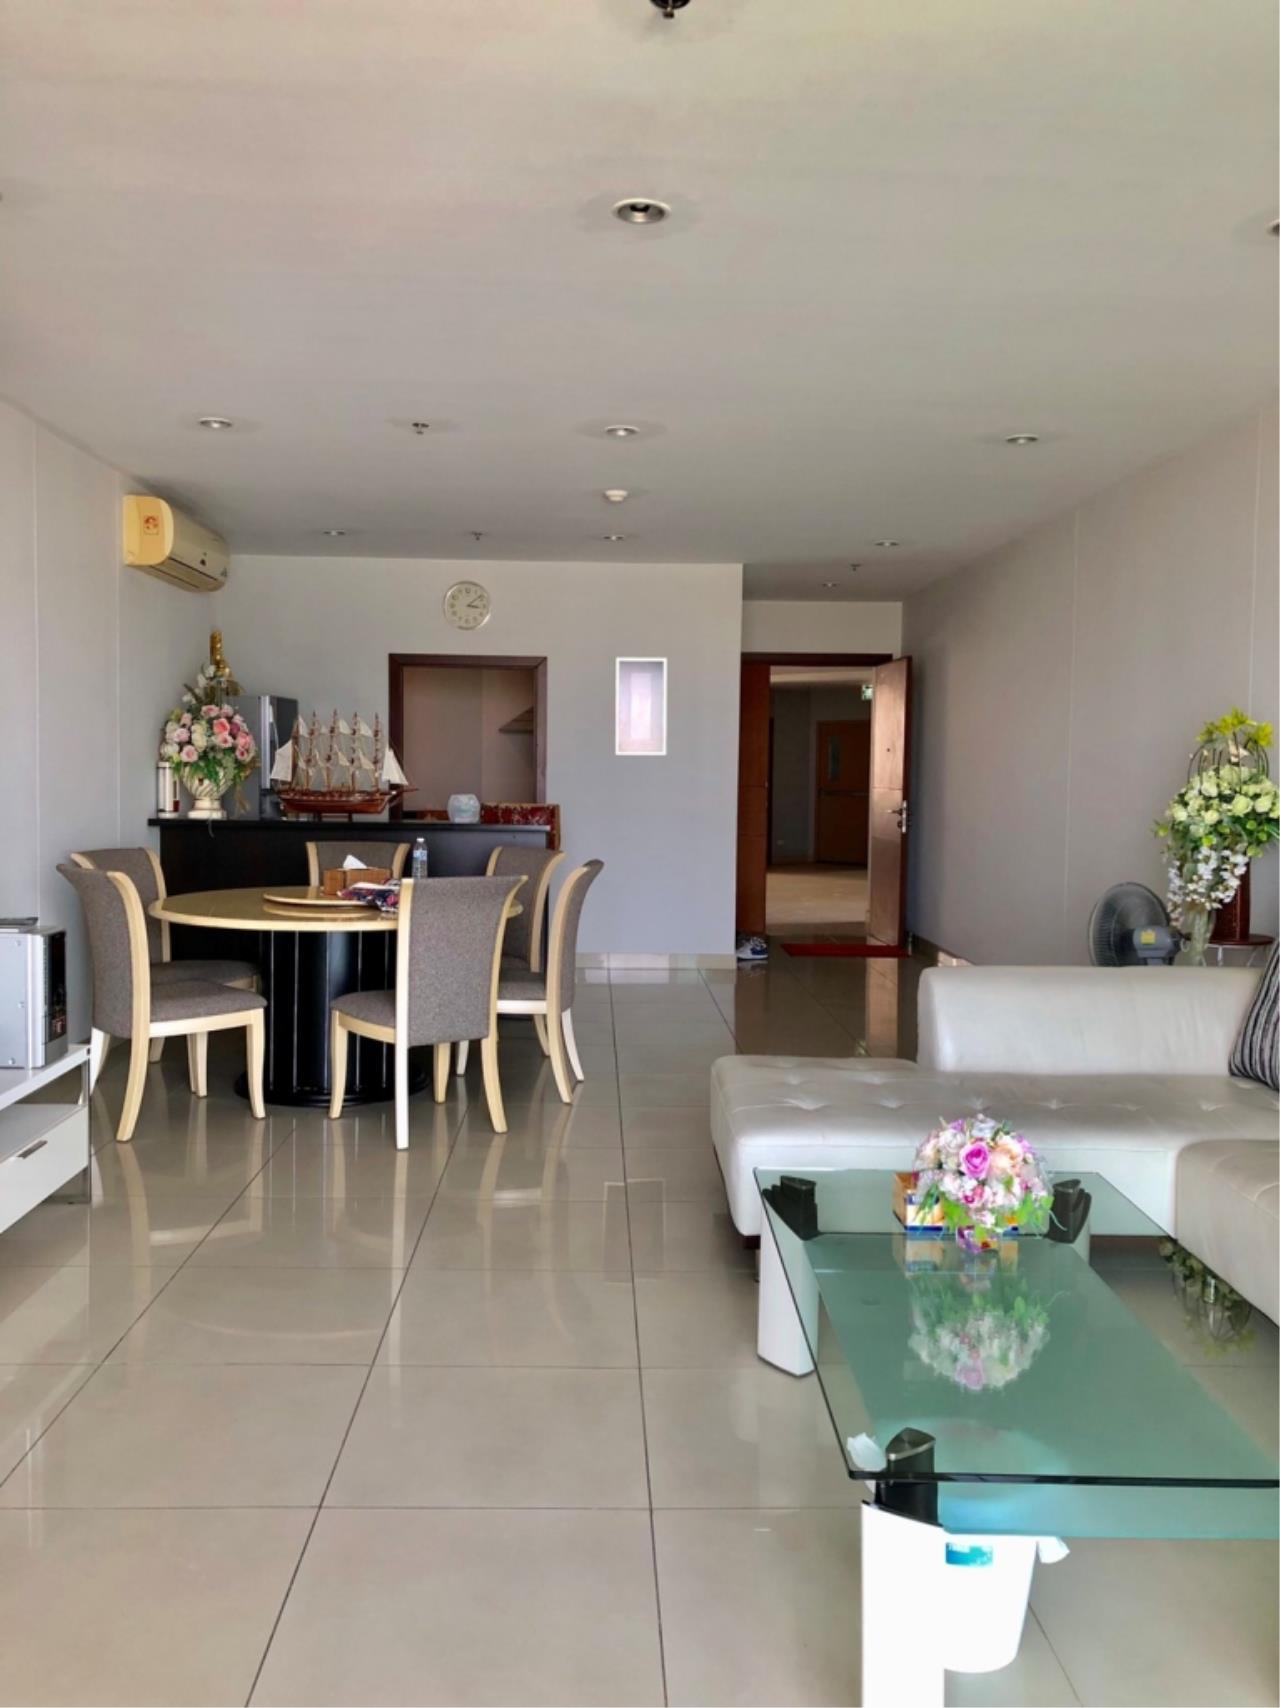 Century21 Skylux Agency's The Star Estate @ Narathiwas / Condo For Sale / 3 Bedroom / 165.34 SQM / BTS Chong Nonsi / Bangkok 1